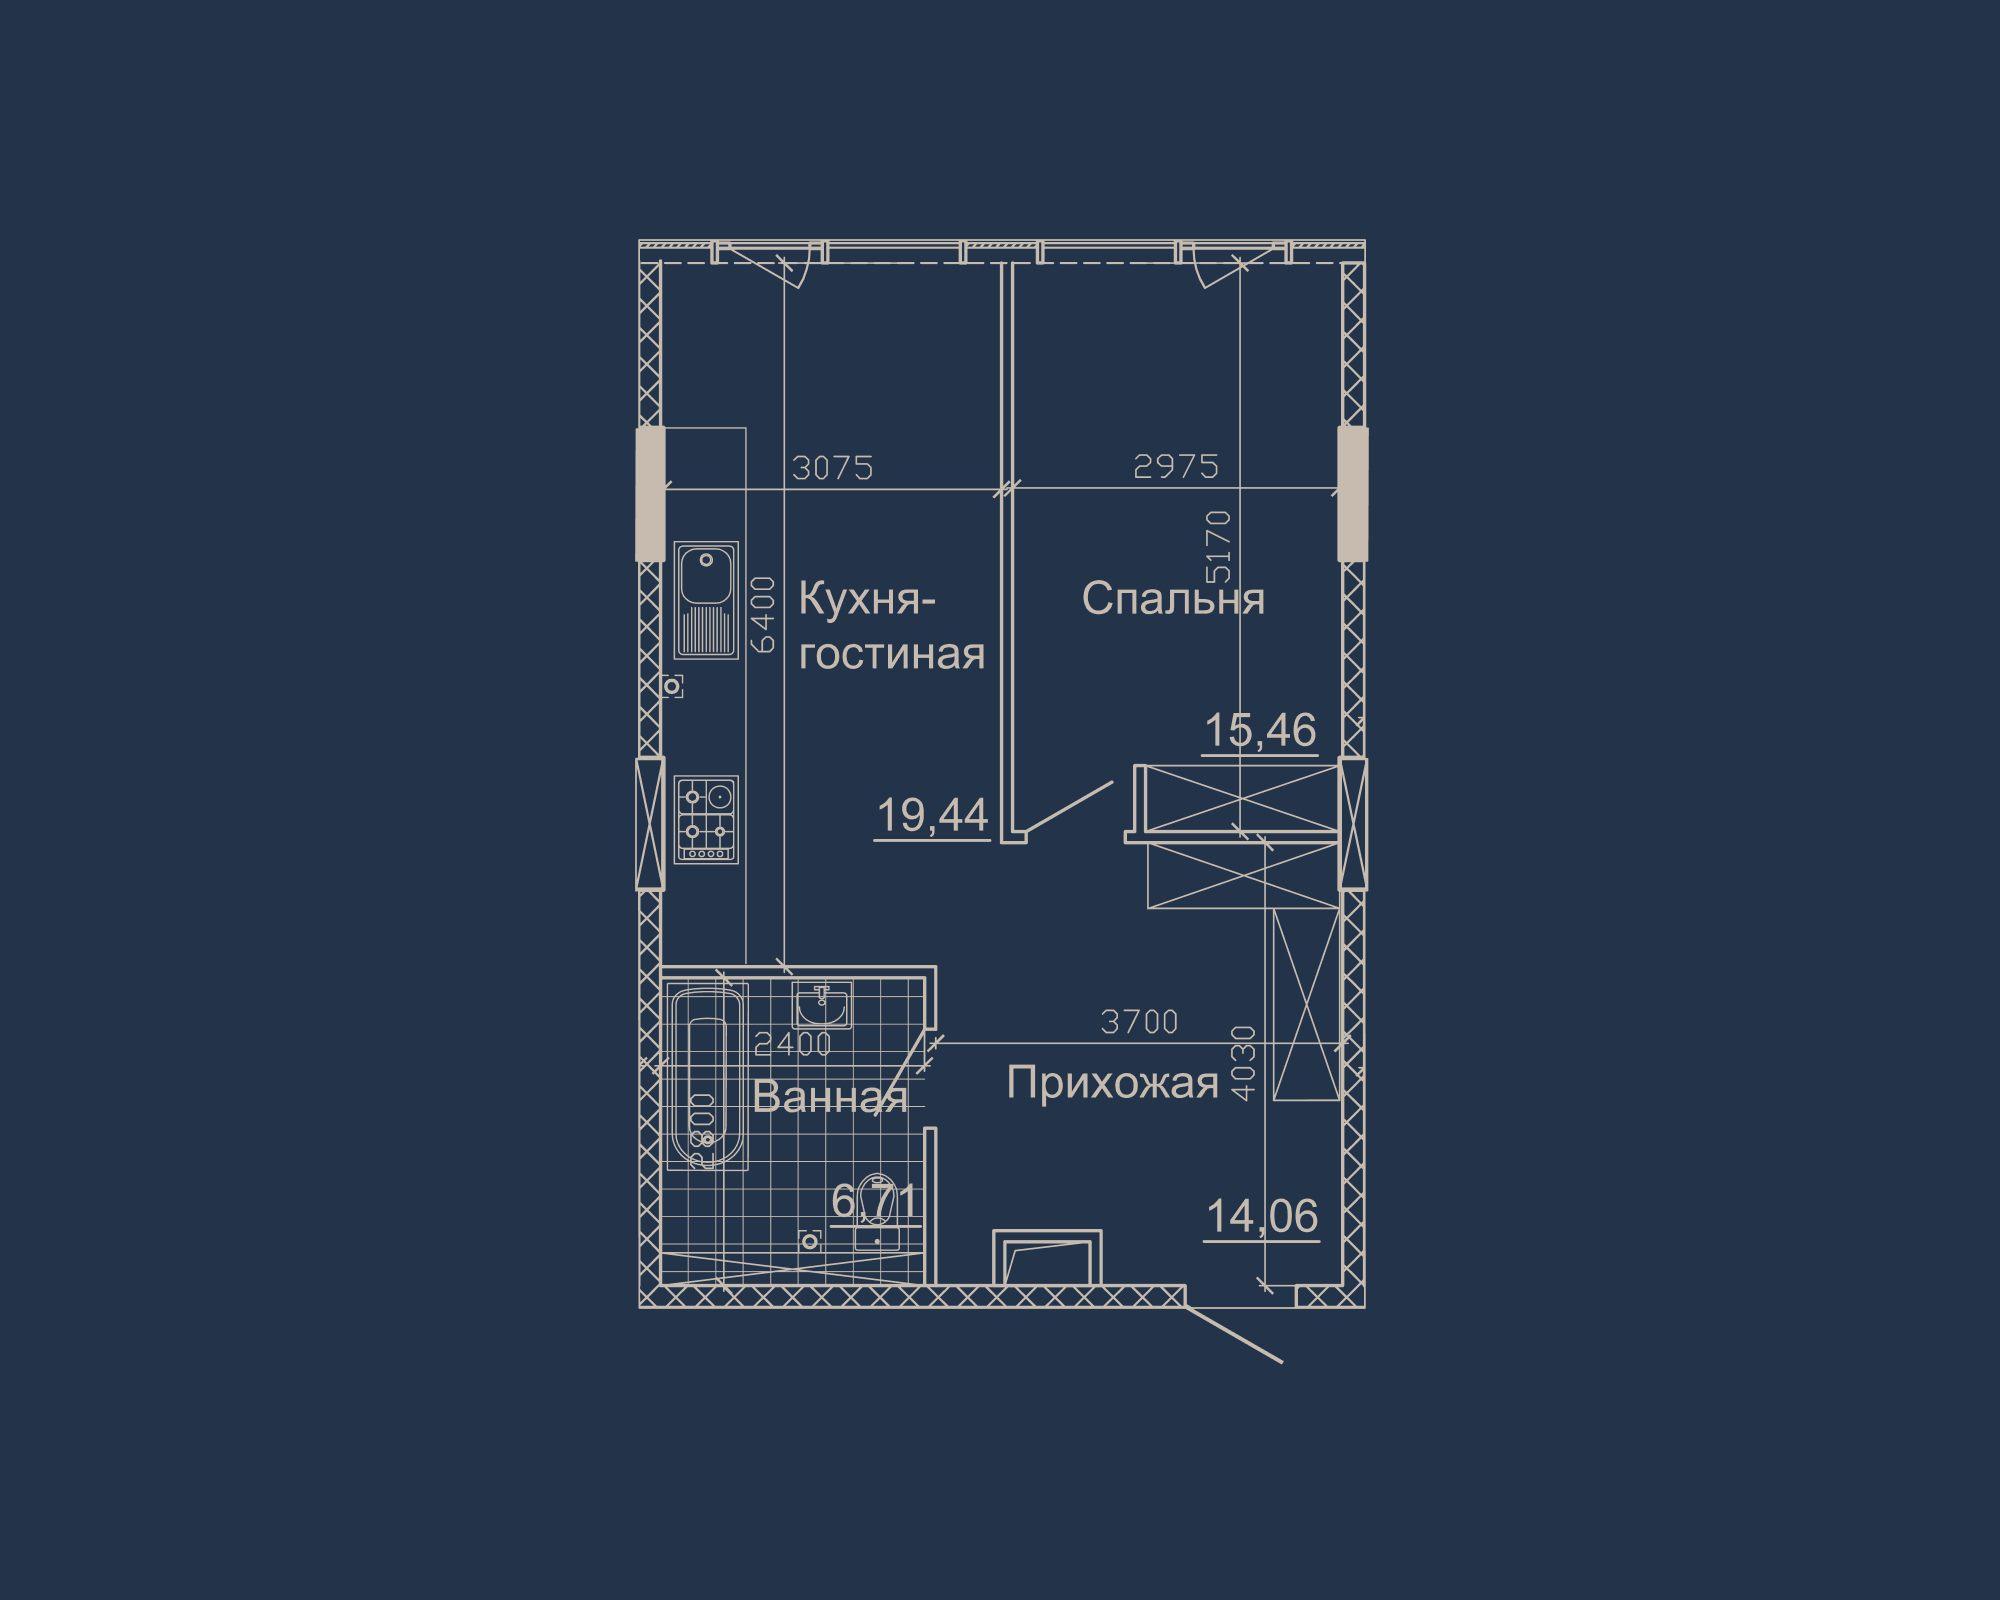 1-кімнатна квартира типу 03А у ЖК Nebo